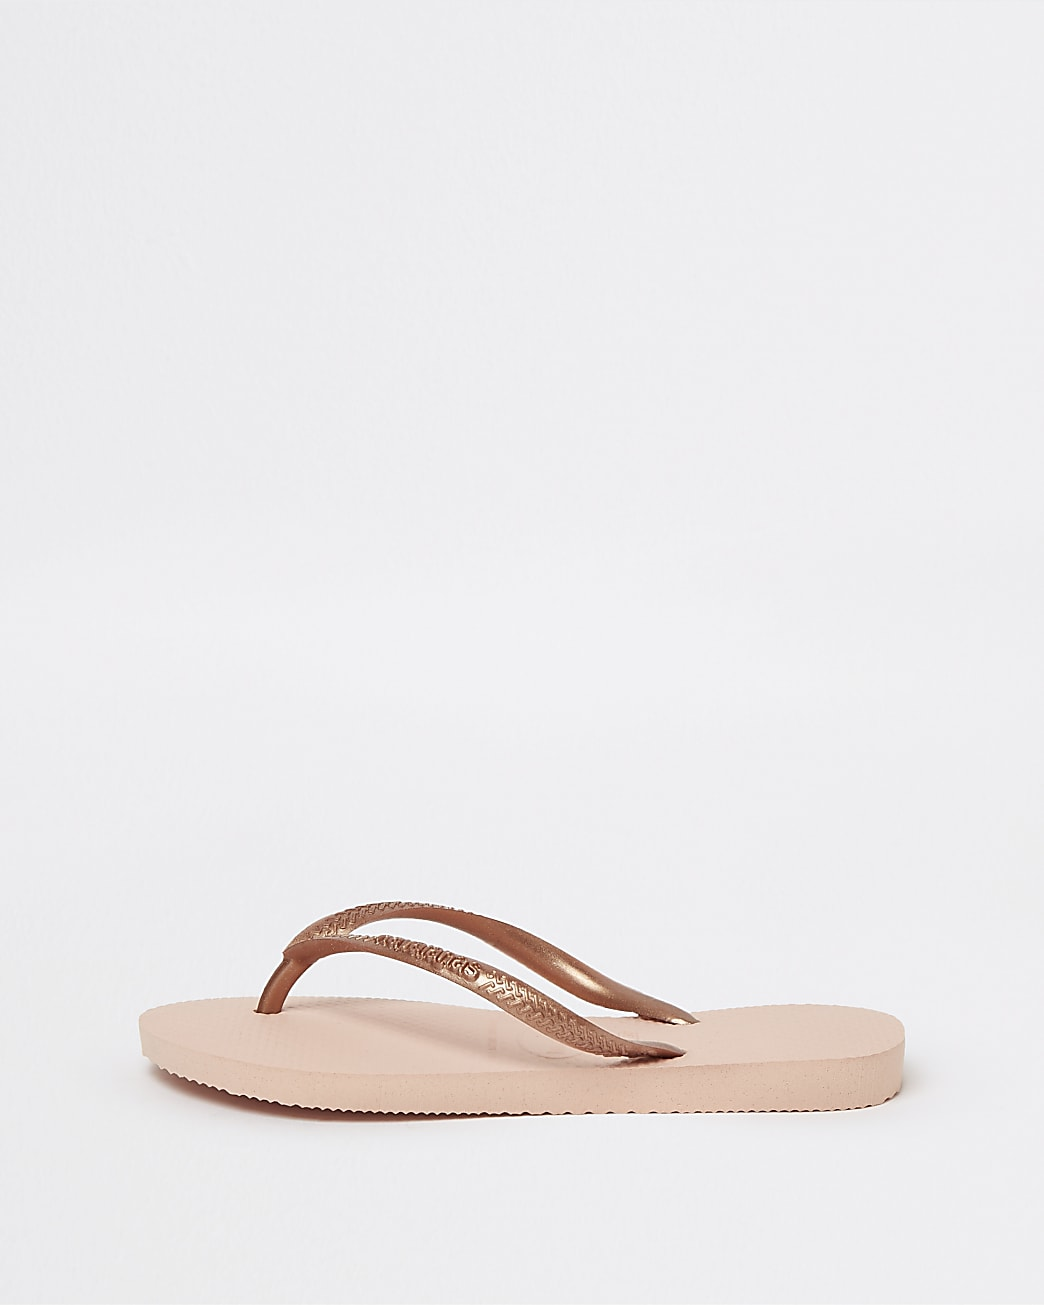 Girls rose gold Havaianas flip flops